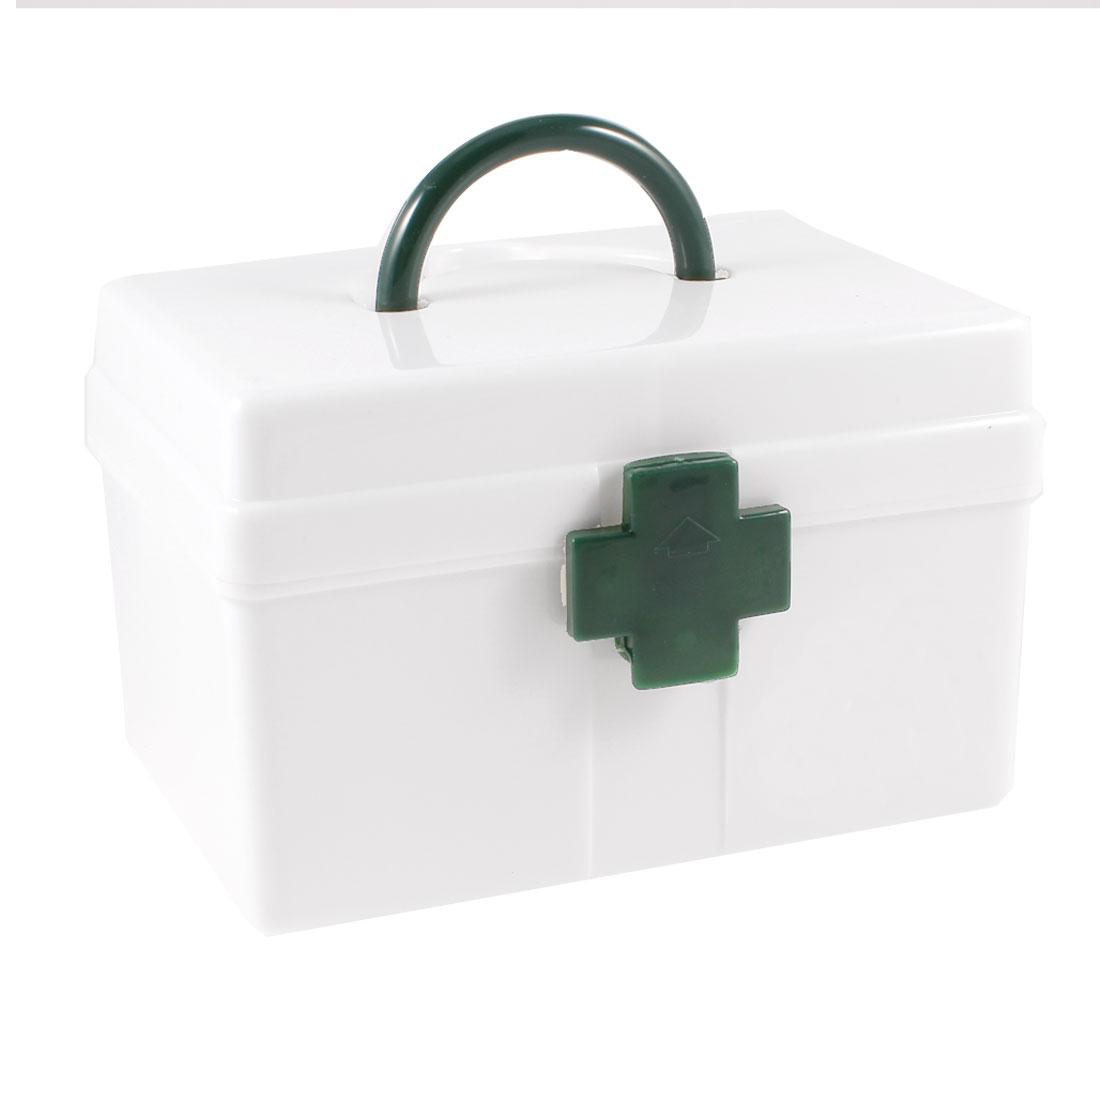 "Portable White Plastic Kits Medicine Box Storage Case 6.4""x4.5""x4.3"""